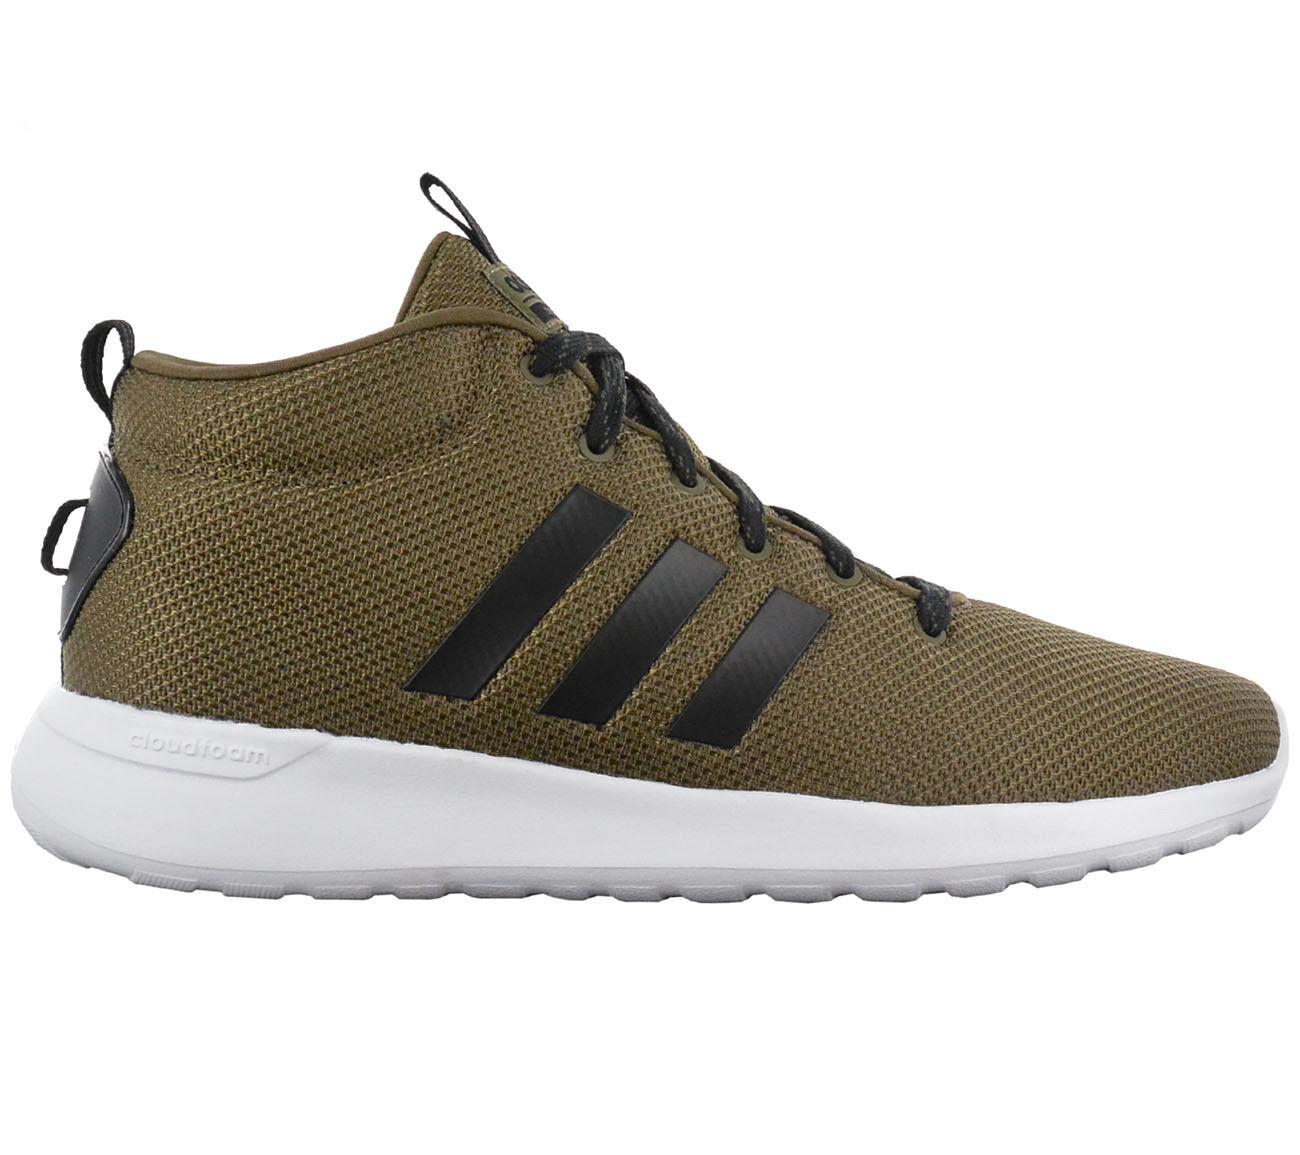 Adidas Originals Turnschuhe Herren Herren Herren Lifestyle Schuhe Freizeit Turnschuhe X PLR NMD 273618